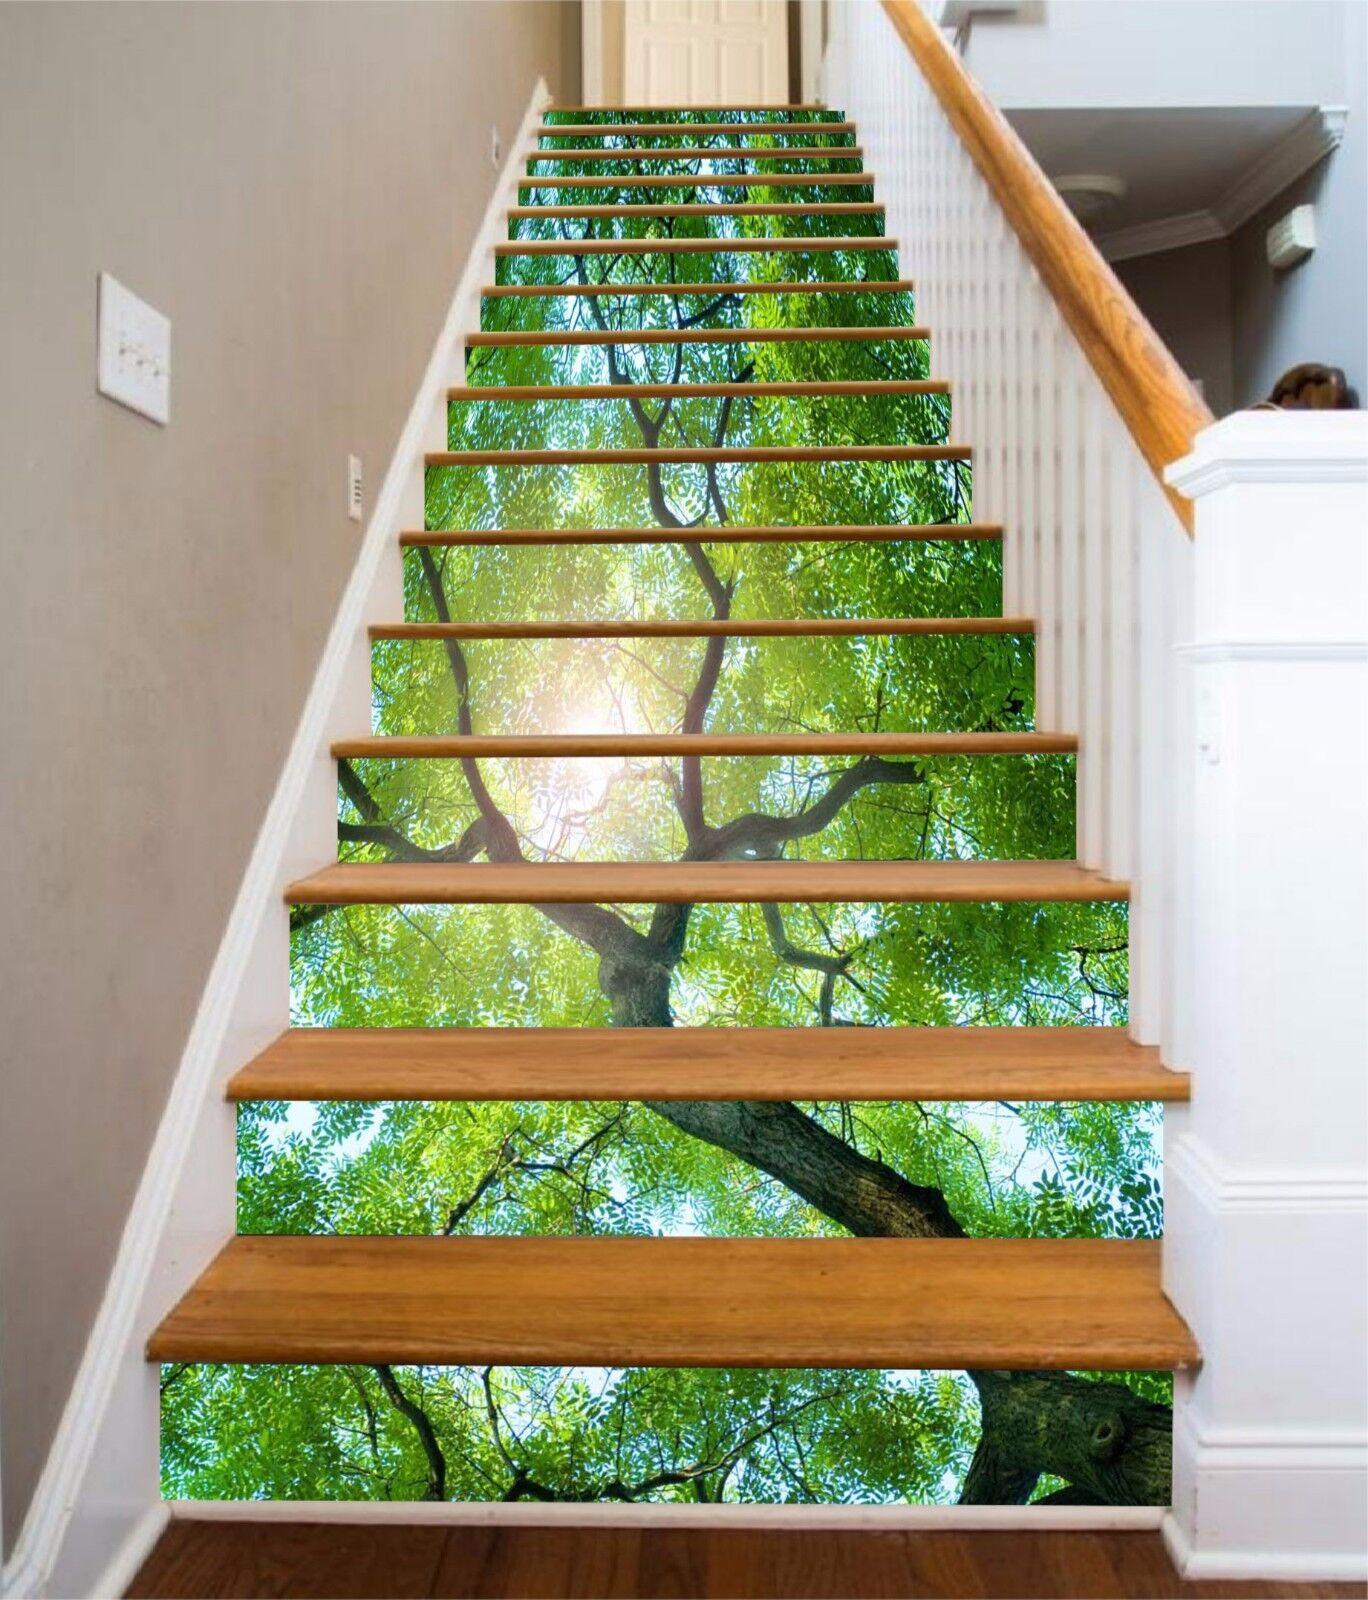 3D Pretty Tree 816 Stair Risers Decoration Photo Mural Vinyl Decal Wallpaper AU